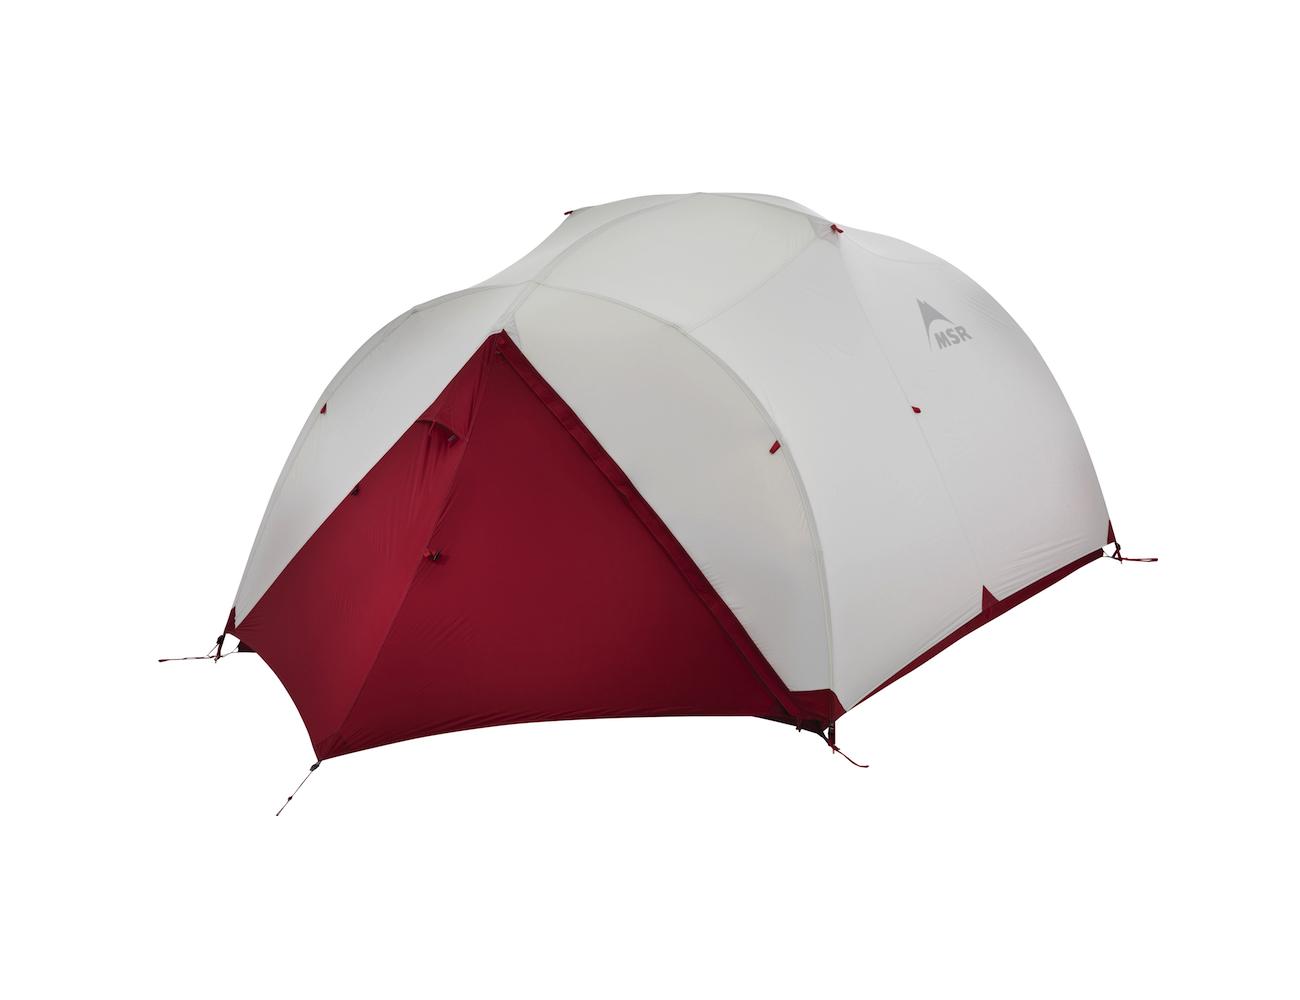 MSR Hubba Hubba NX Freestanding Backpacking Tent  sc 1 st  Gadget Flow & MSR Hubba Hubba NX Freestanding Backpacking Tent